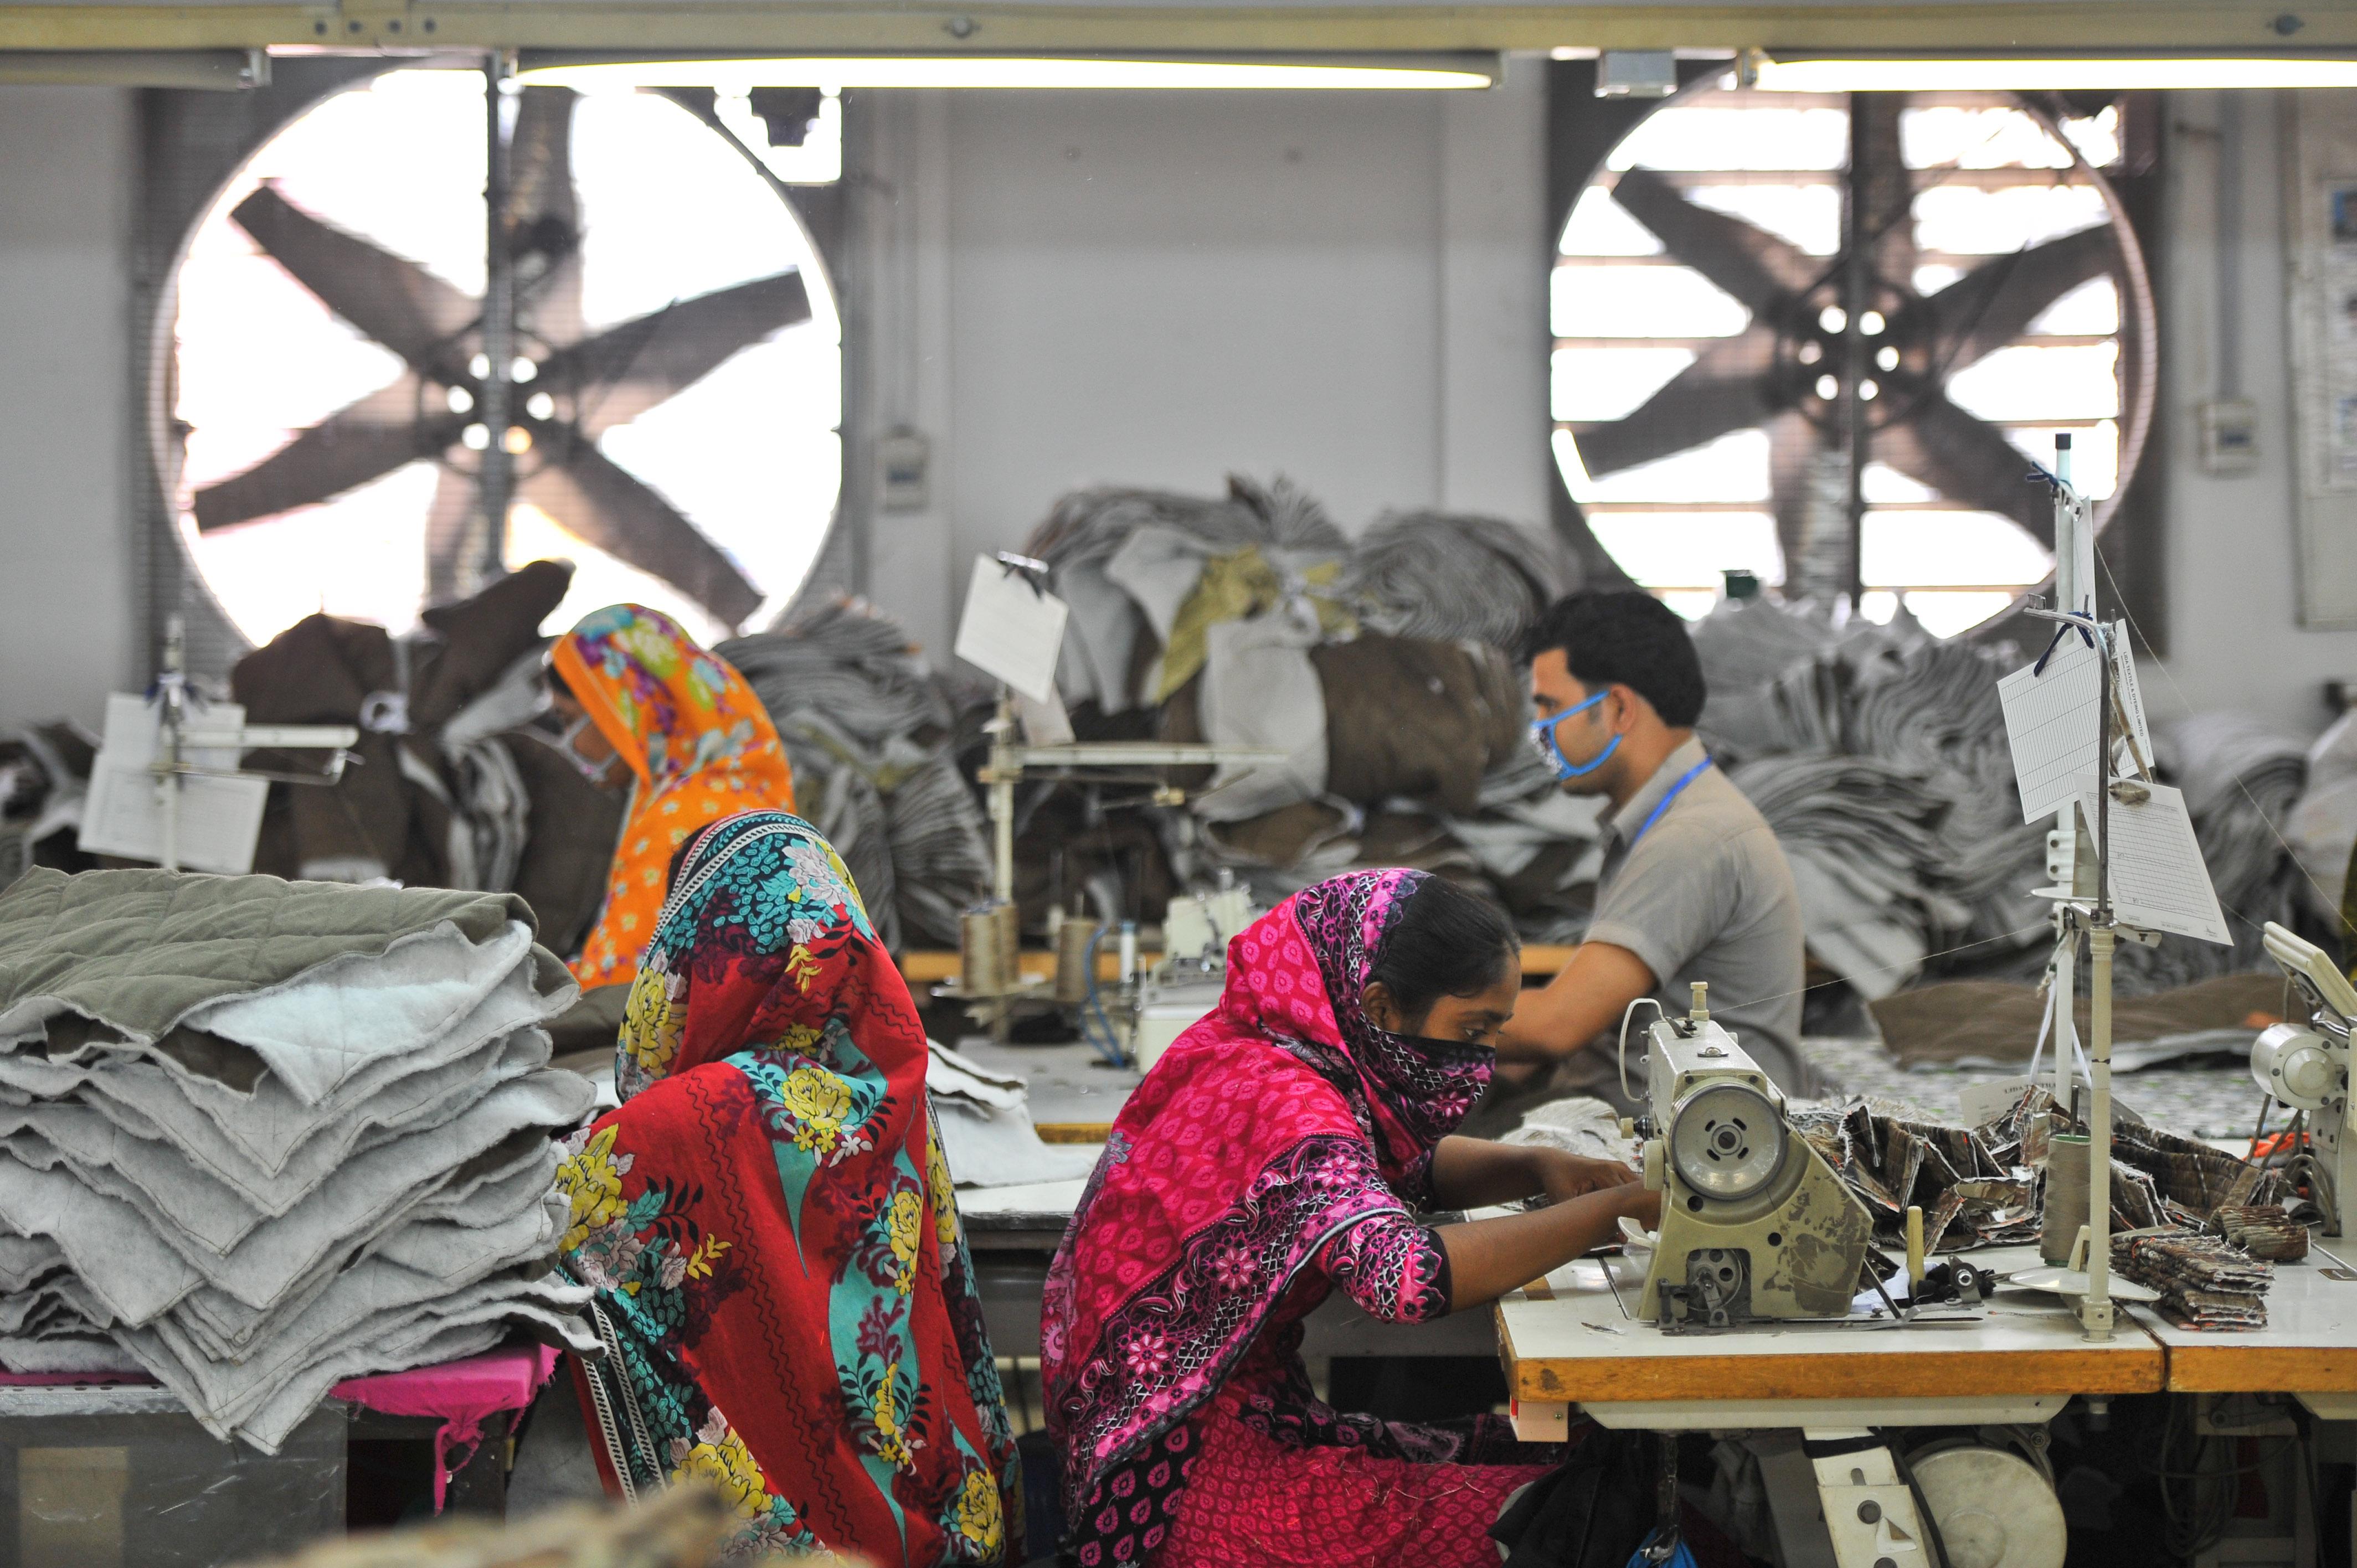 Garment factory in Dhaka, Bangladesh